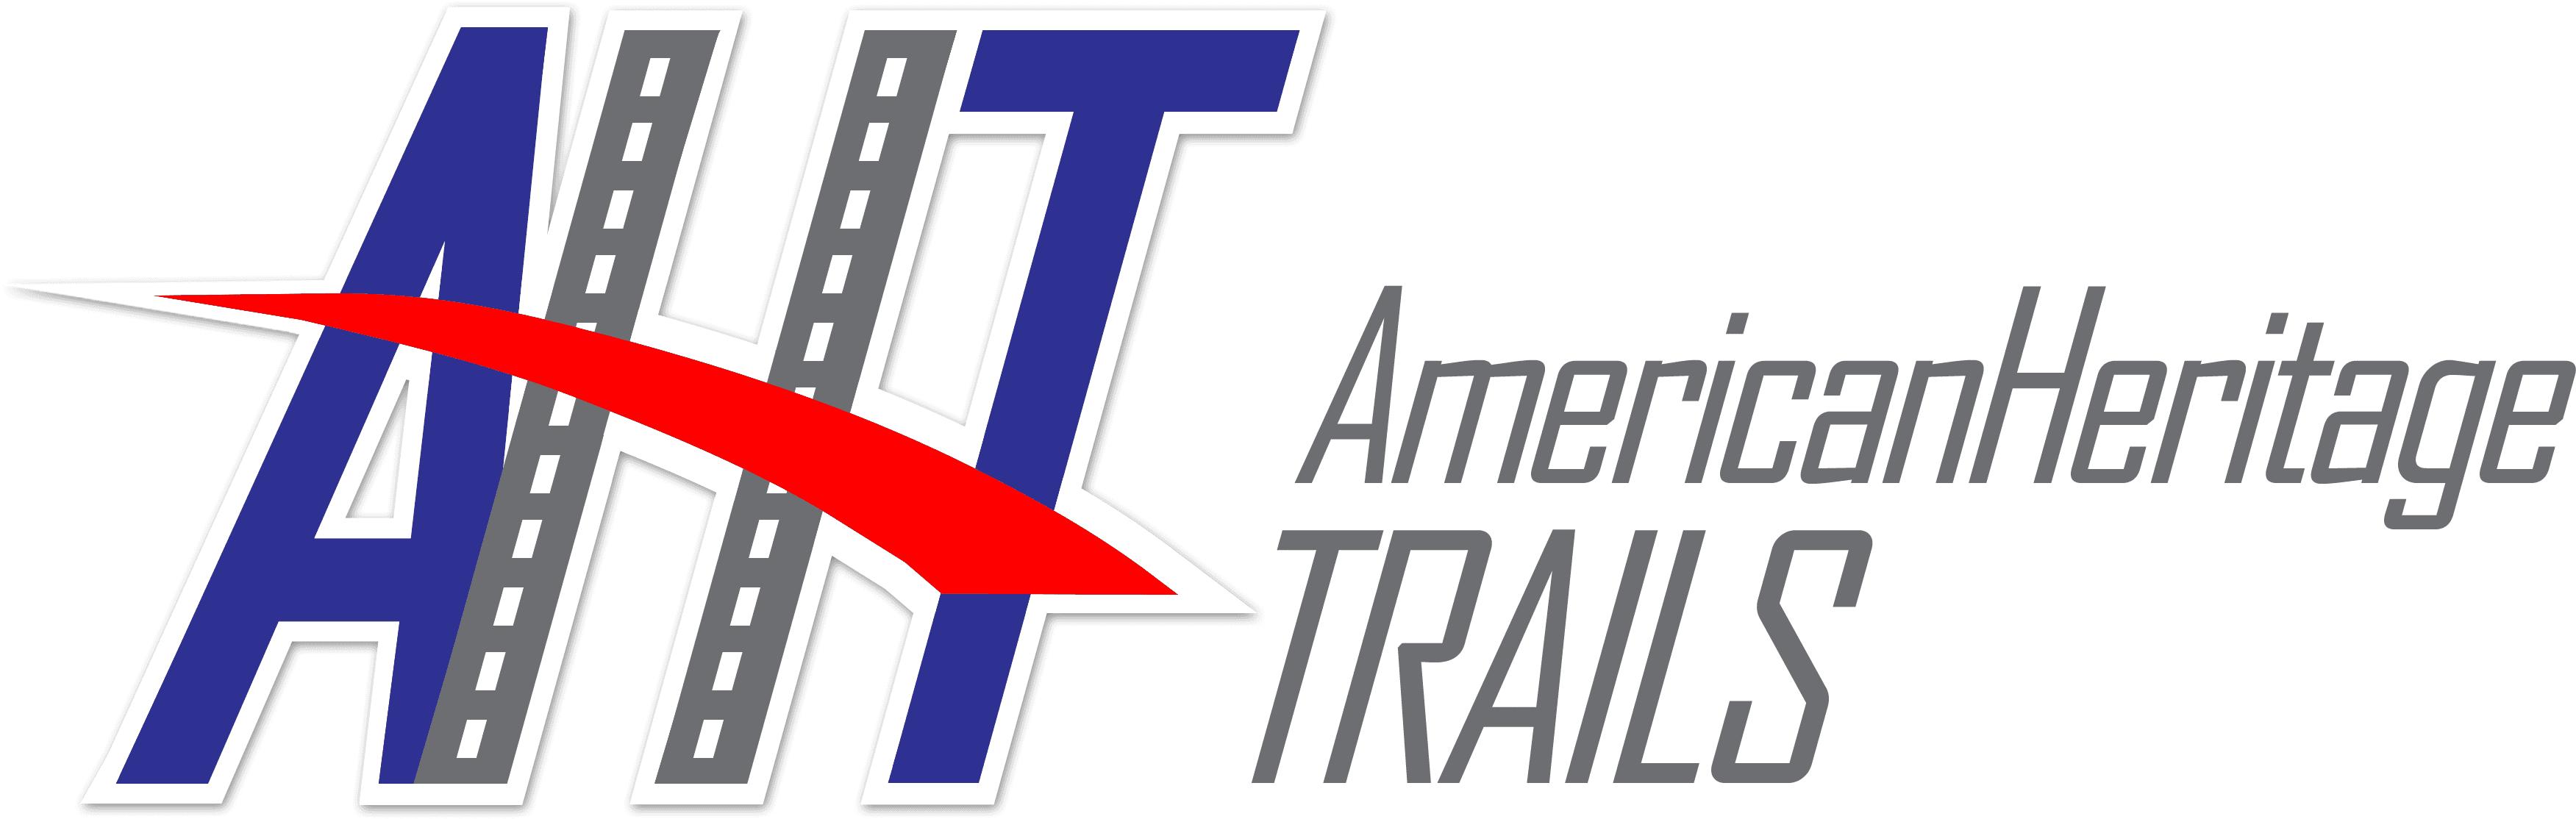 American Heritage Trails - Logo